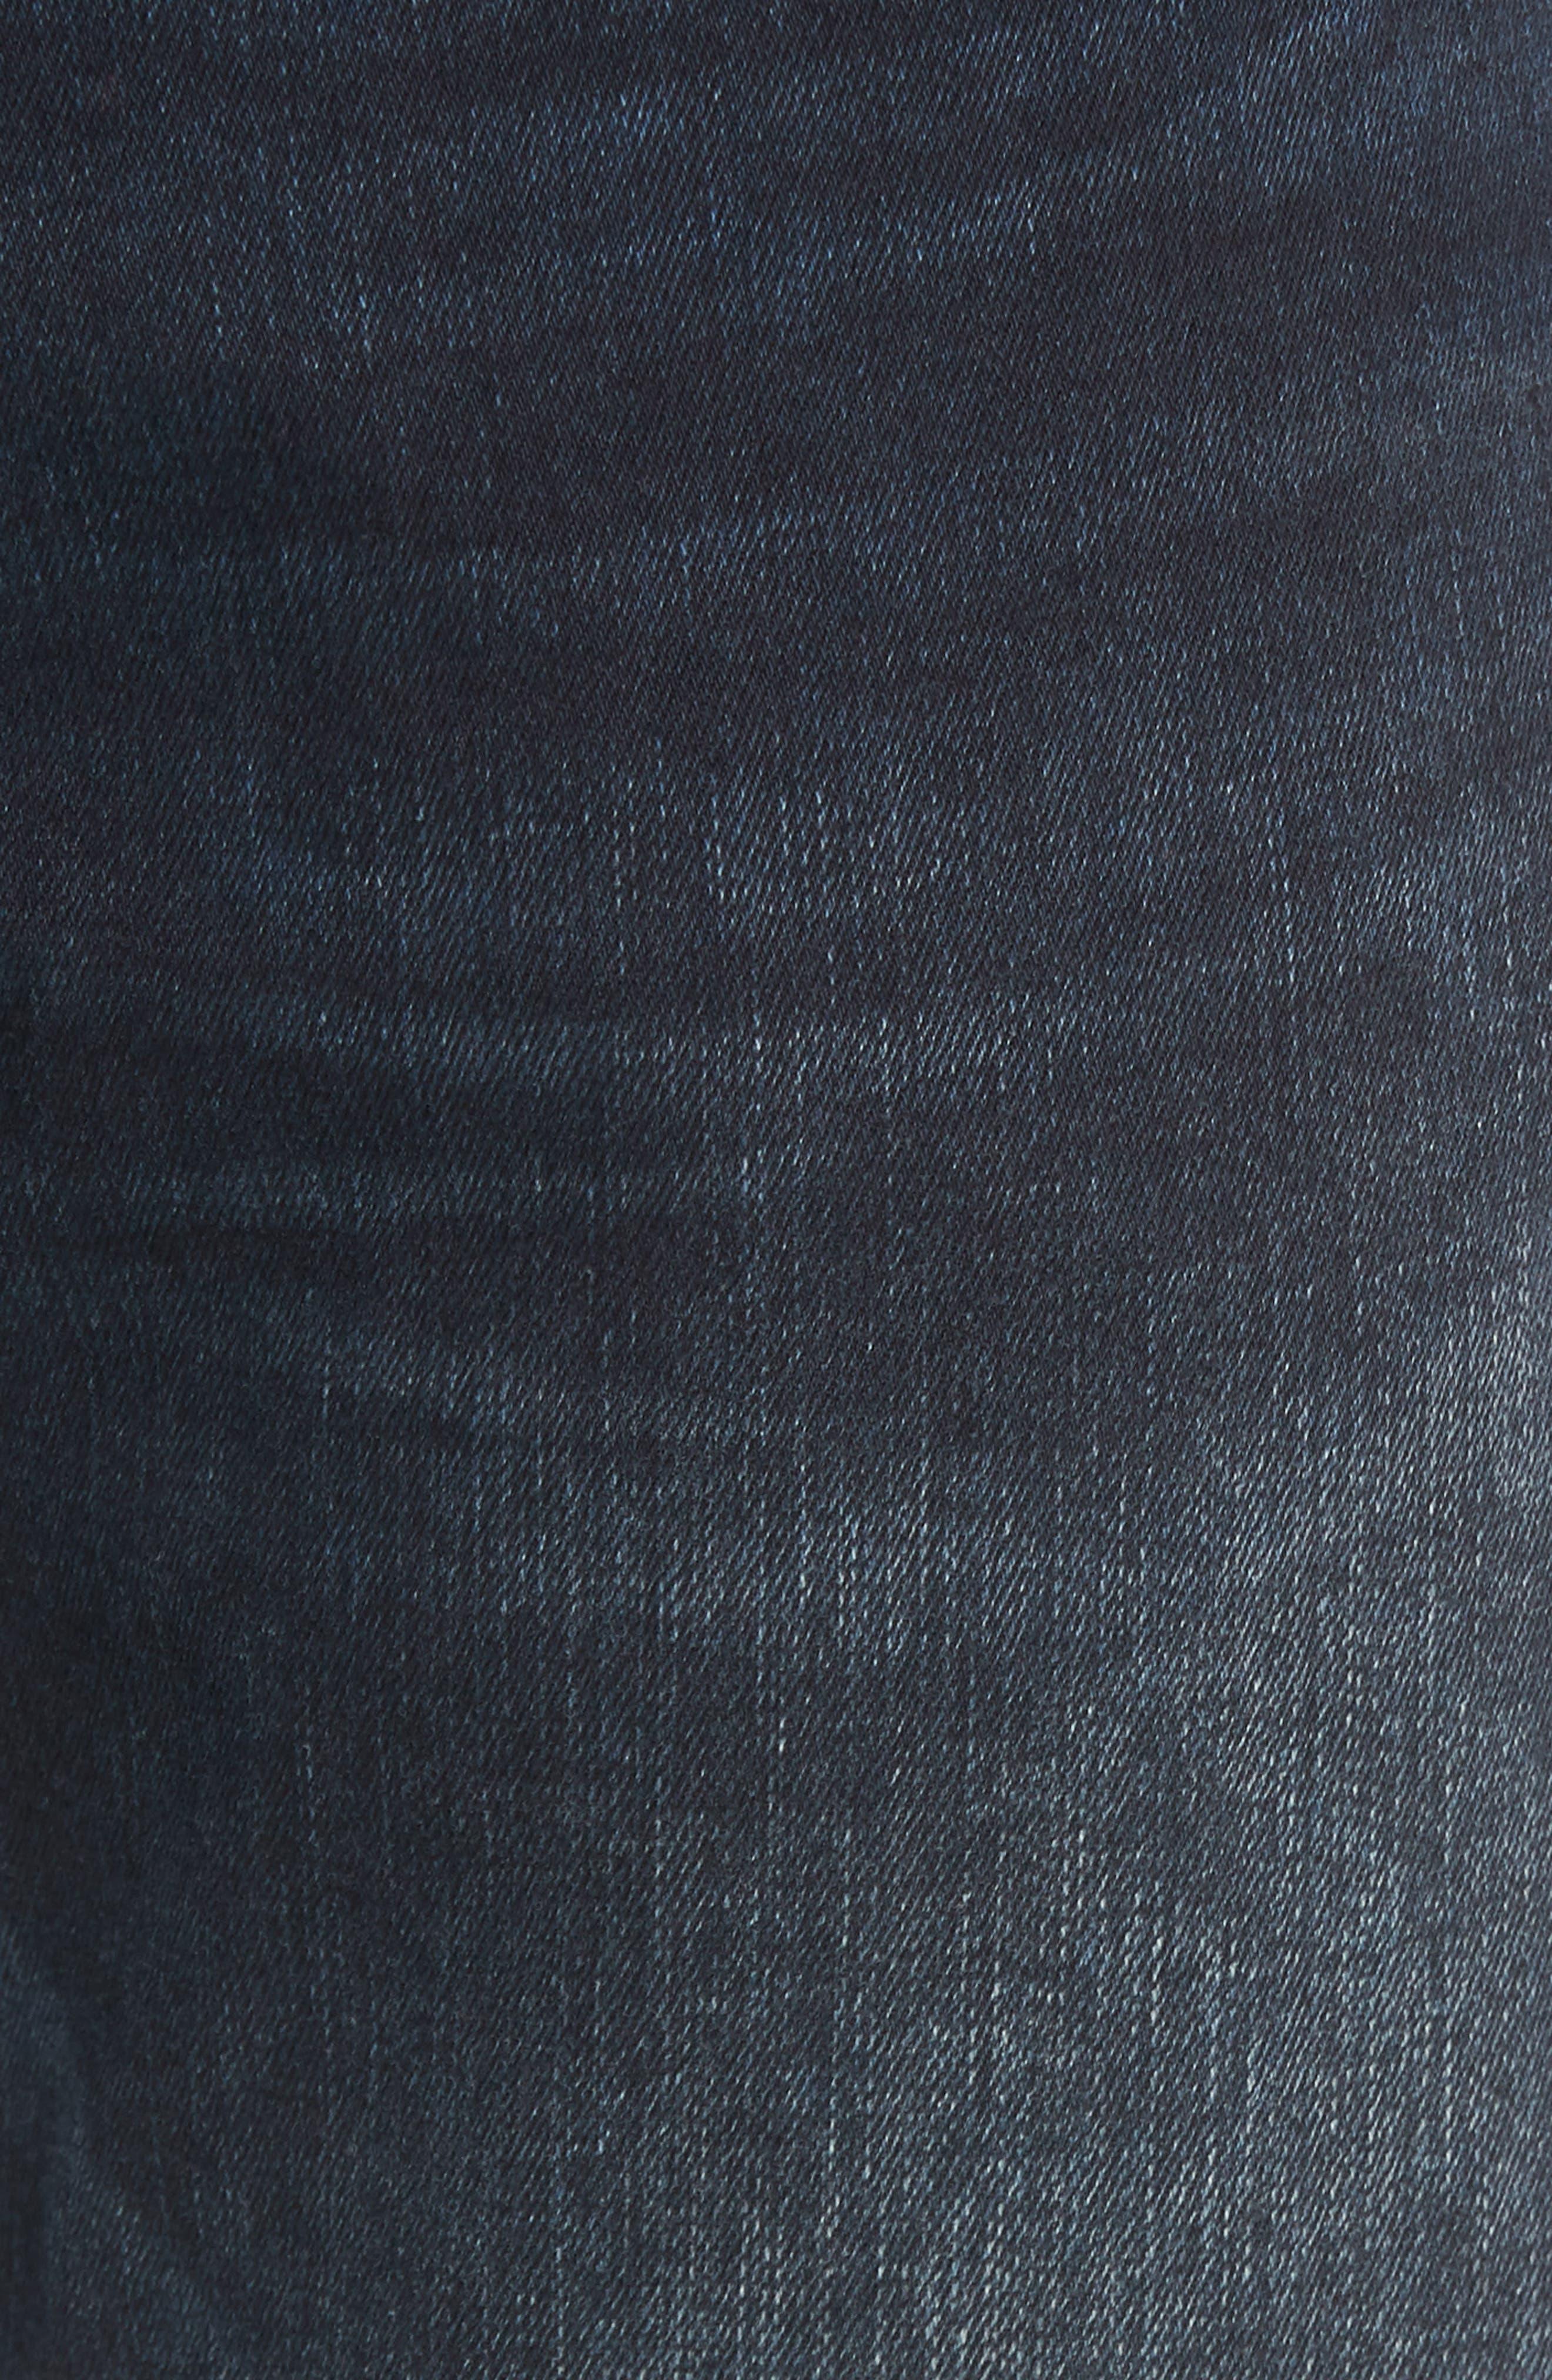 Jake Slim Fit Jeans,                             Alternate thumbnail 5, color,                             Ink Used Authentic Vintage